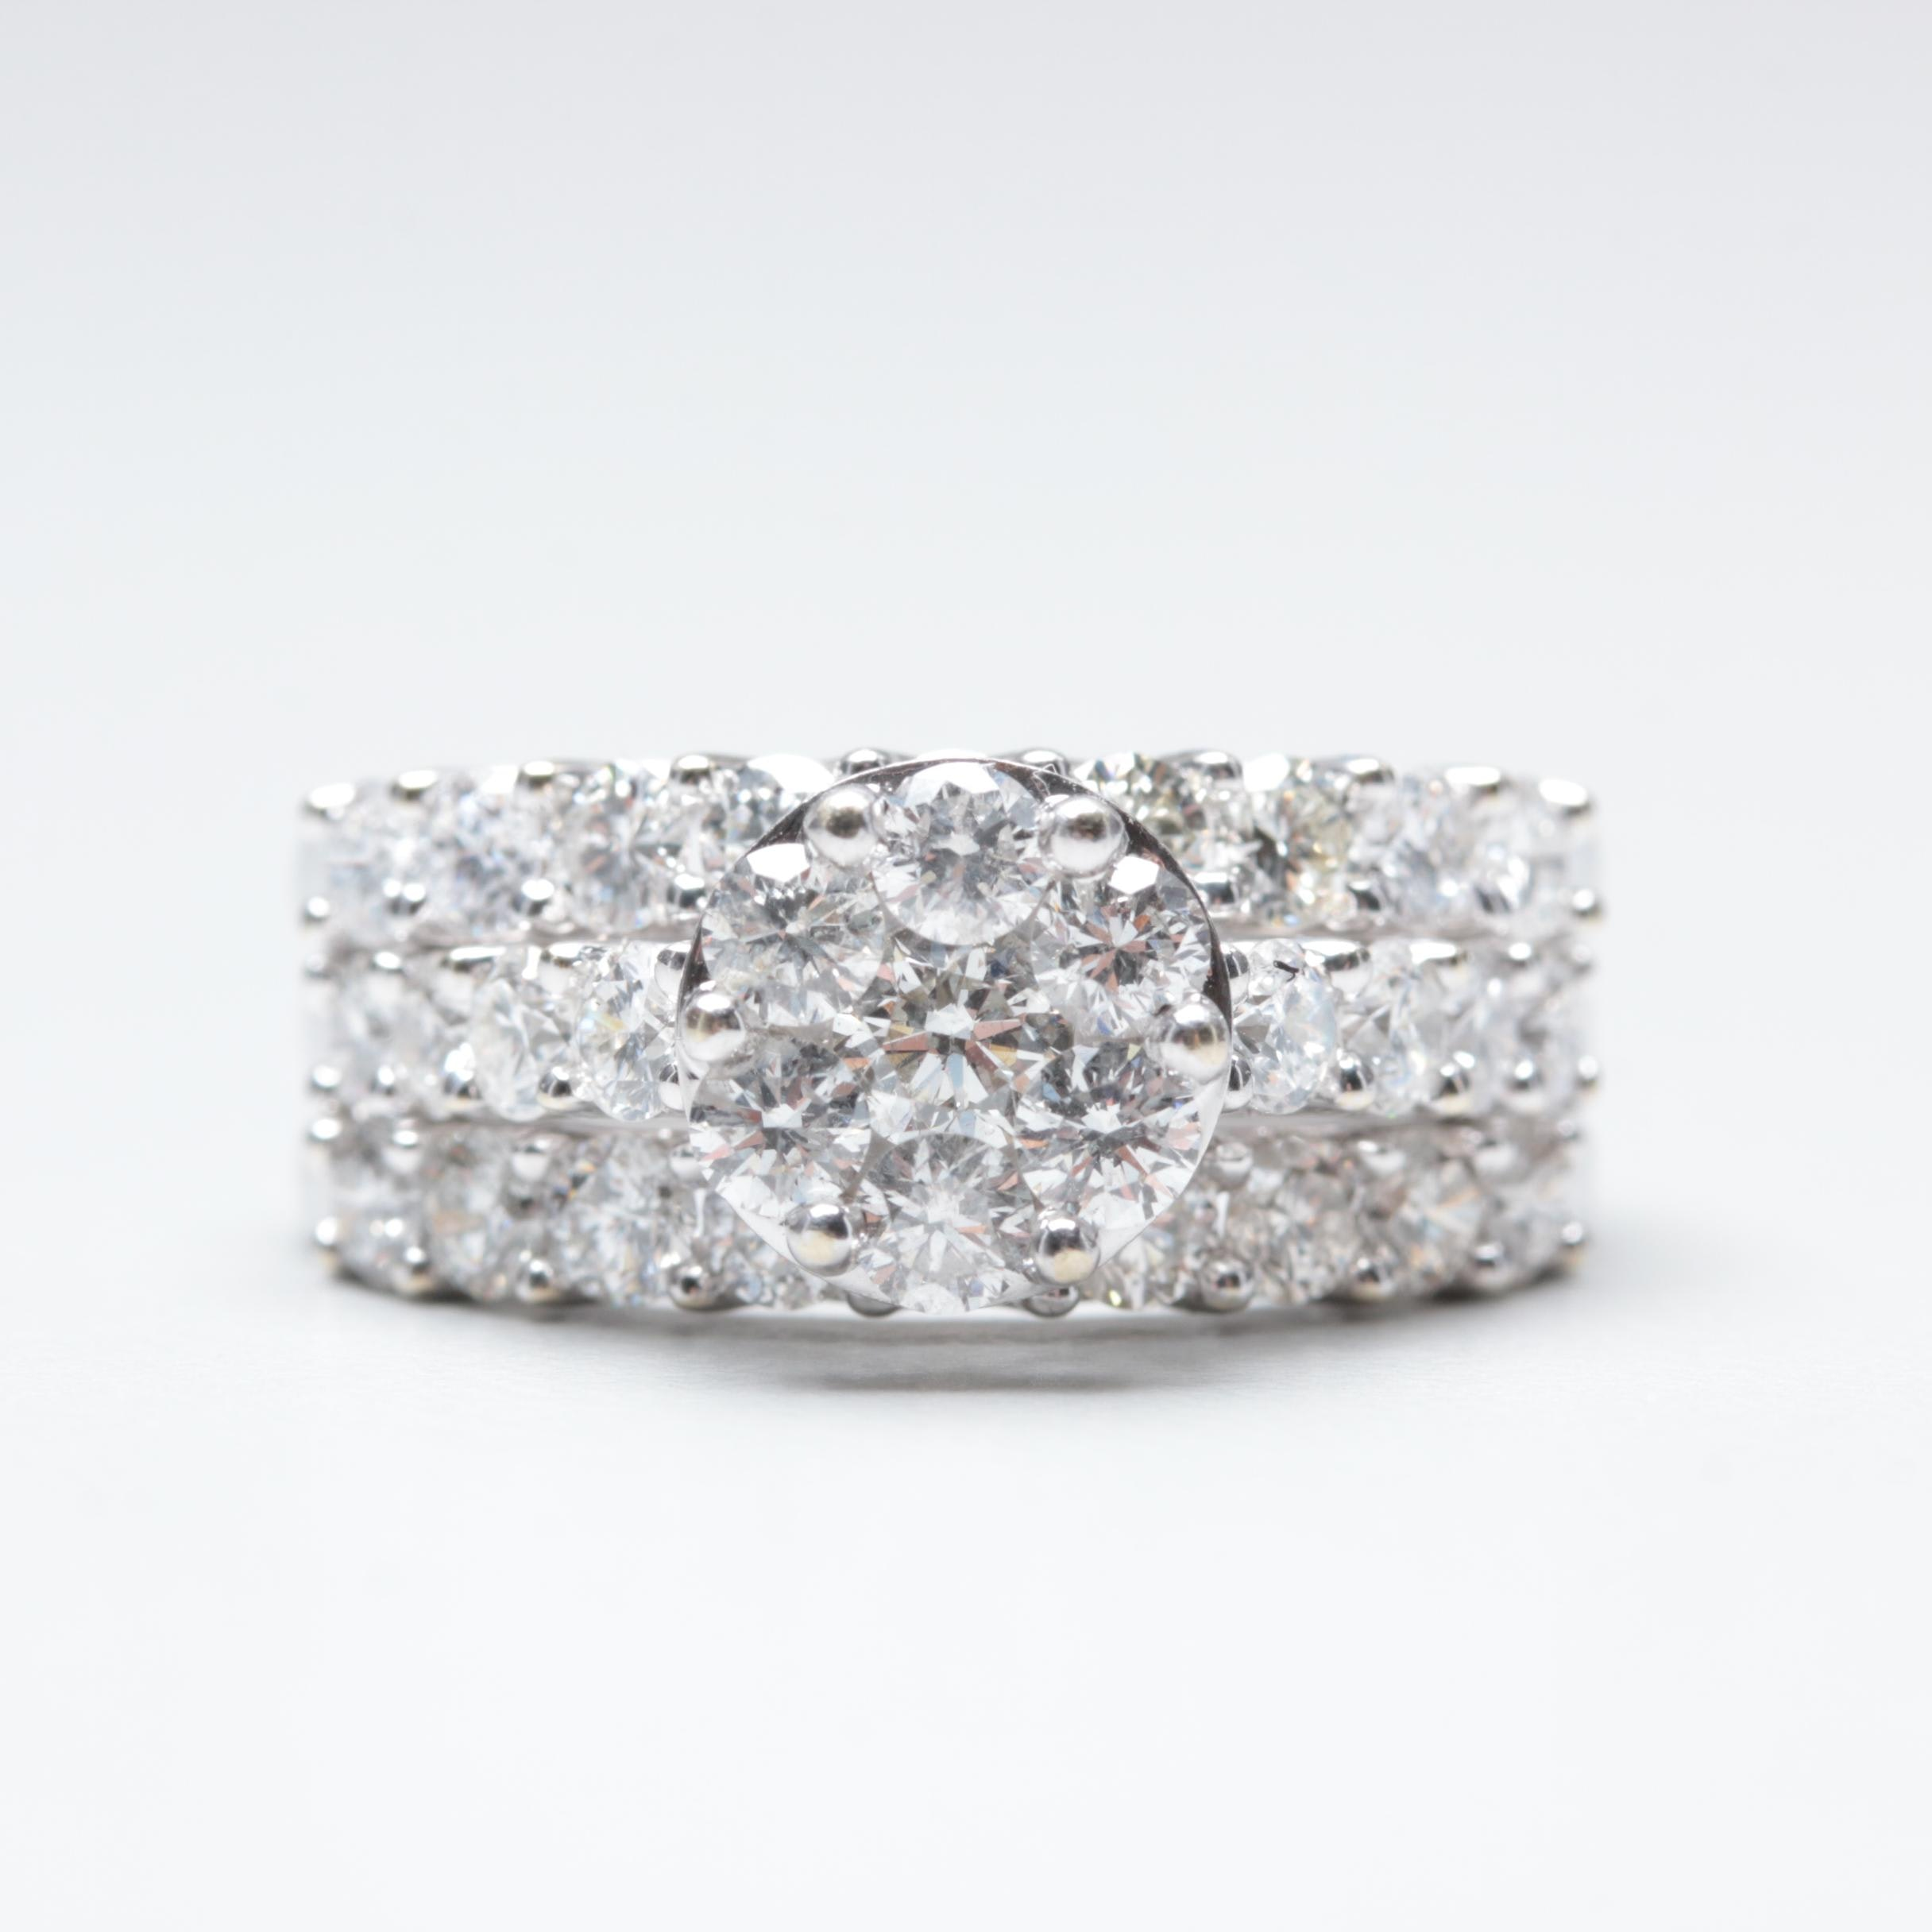 14K White Gold 2.91 CTW Diamond Ring